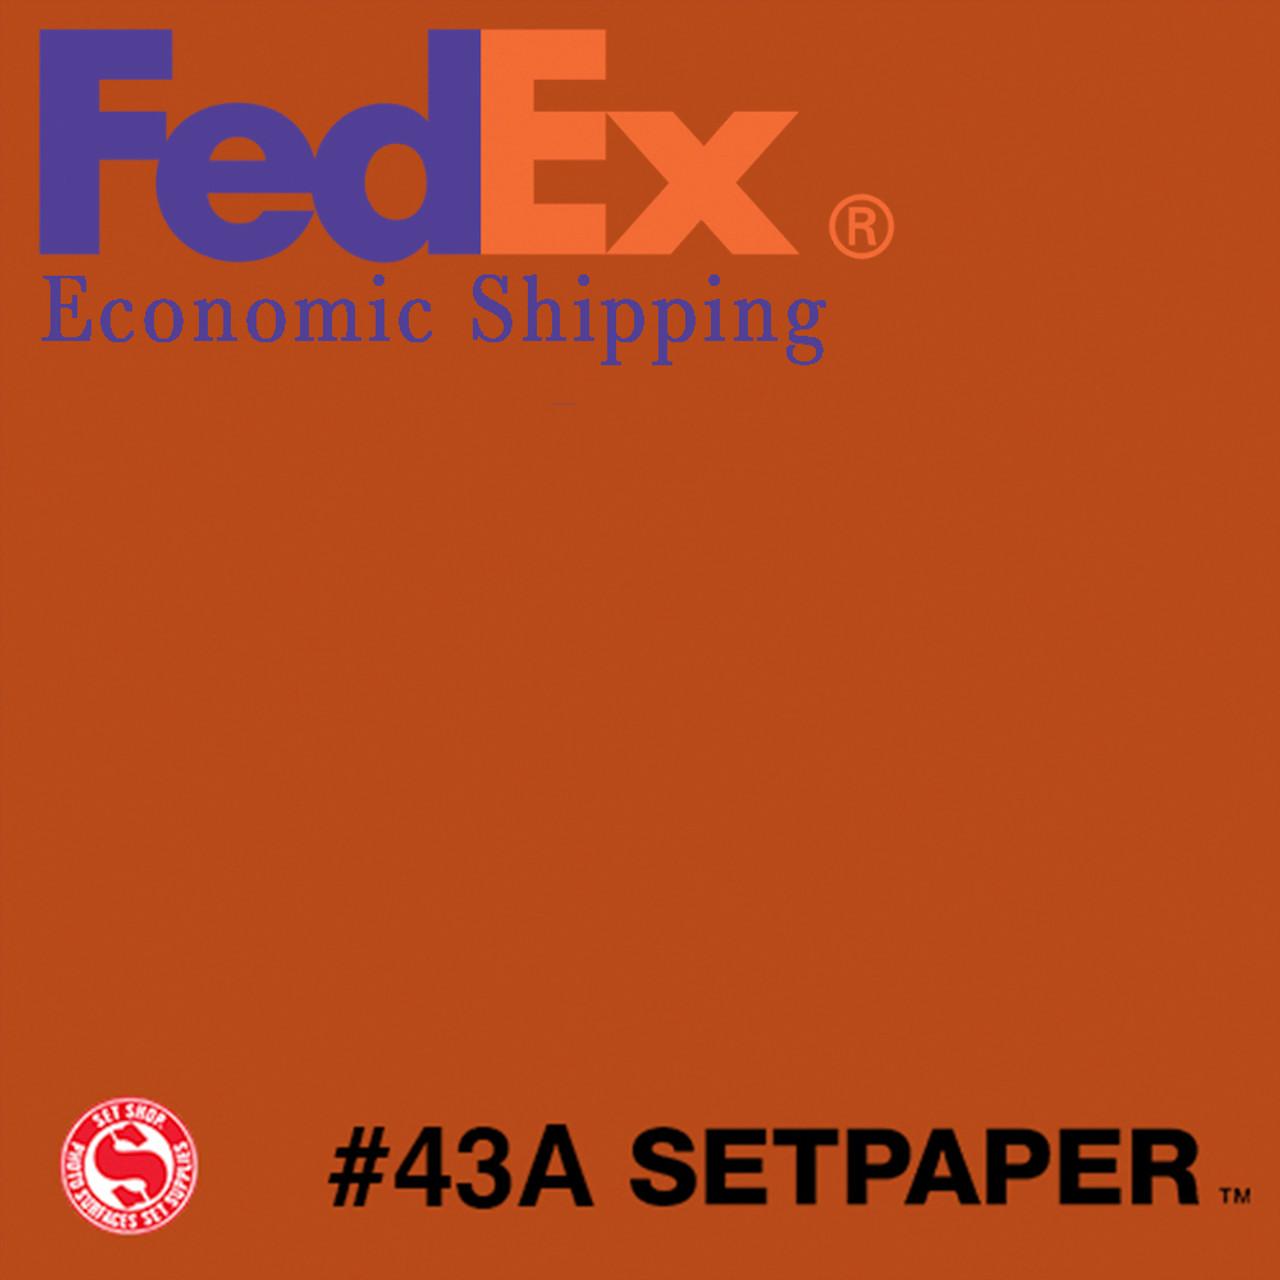 "(ECONOMIC SHIPPING)  SETPAPER - BRIGHT ORANGE 48"" x 36' (1.2 x 11m)"